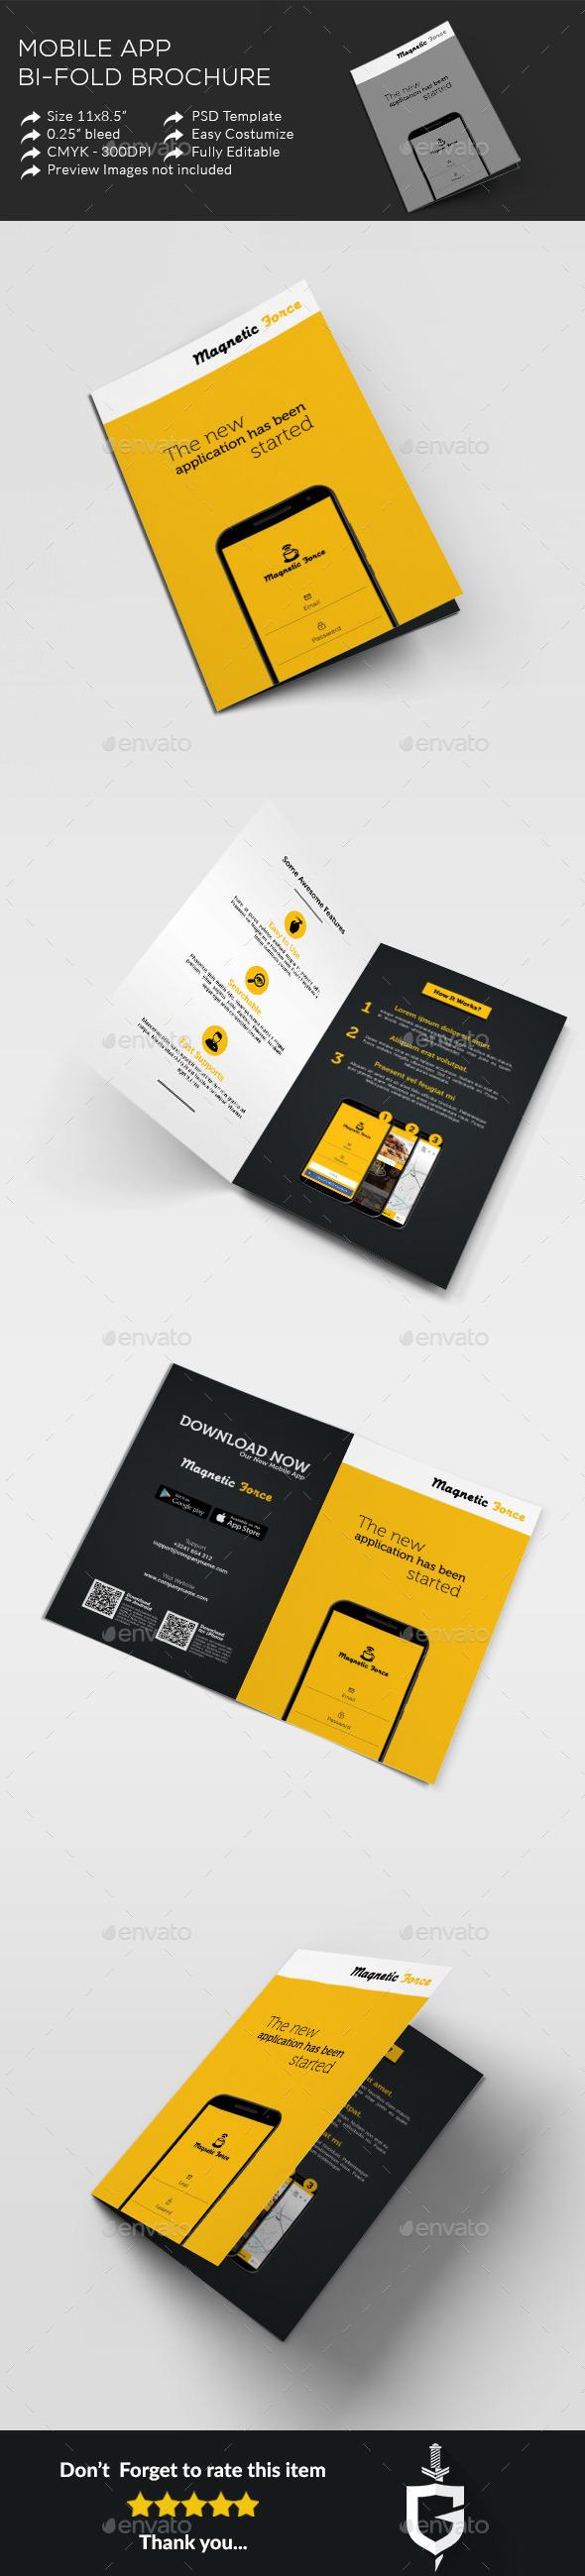 Mobile App Bi-fold Brochure - Corporate Brochures